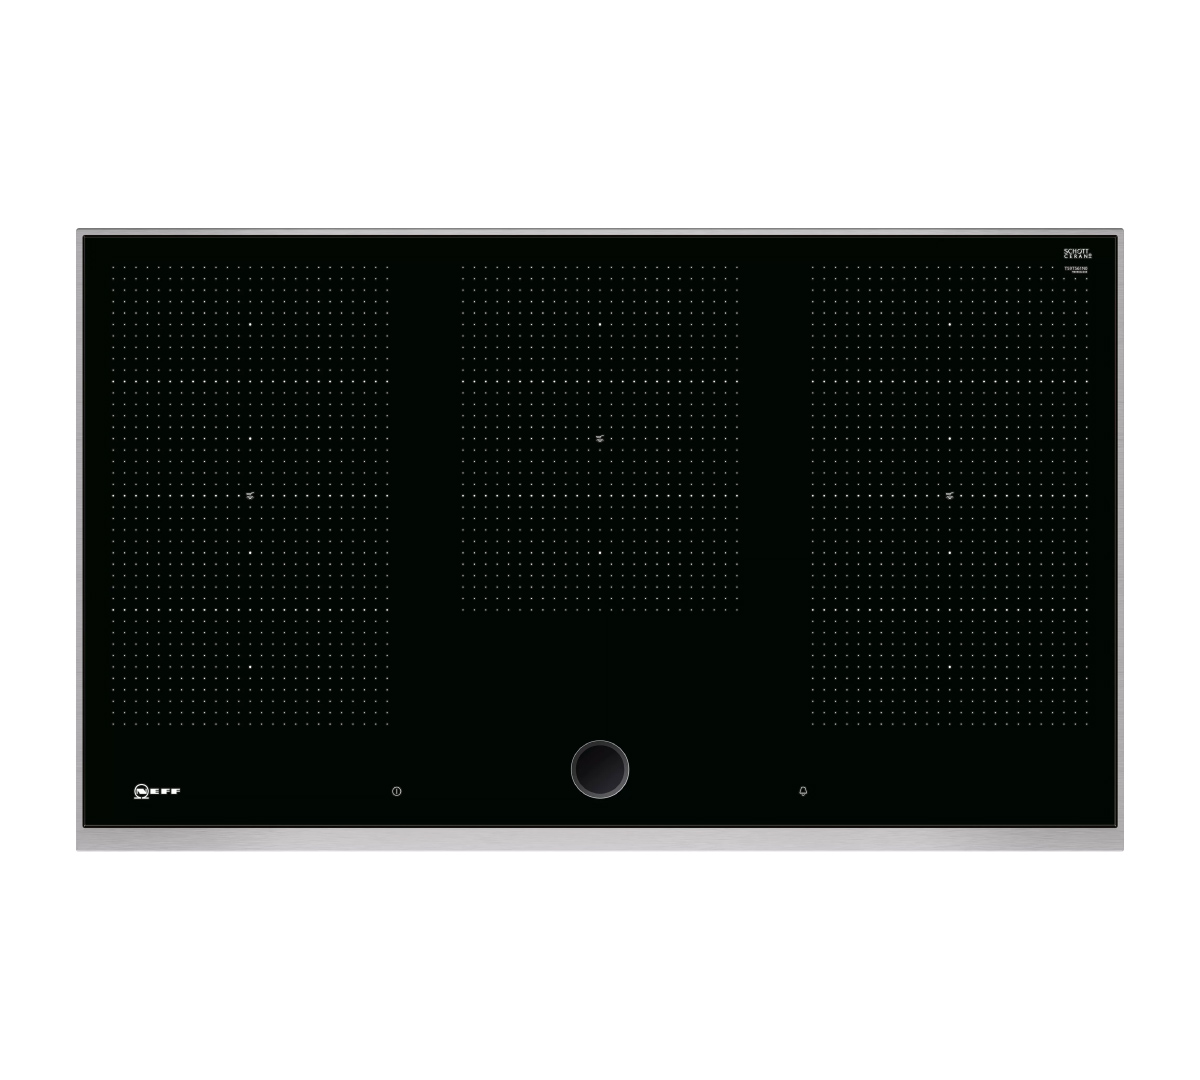 N90 90cm Flex Induction Hob 3 x Flex Zones